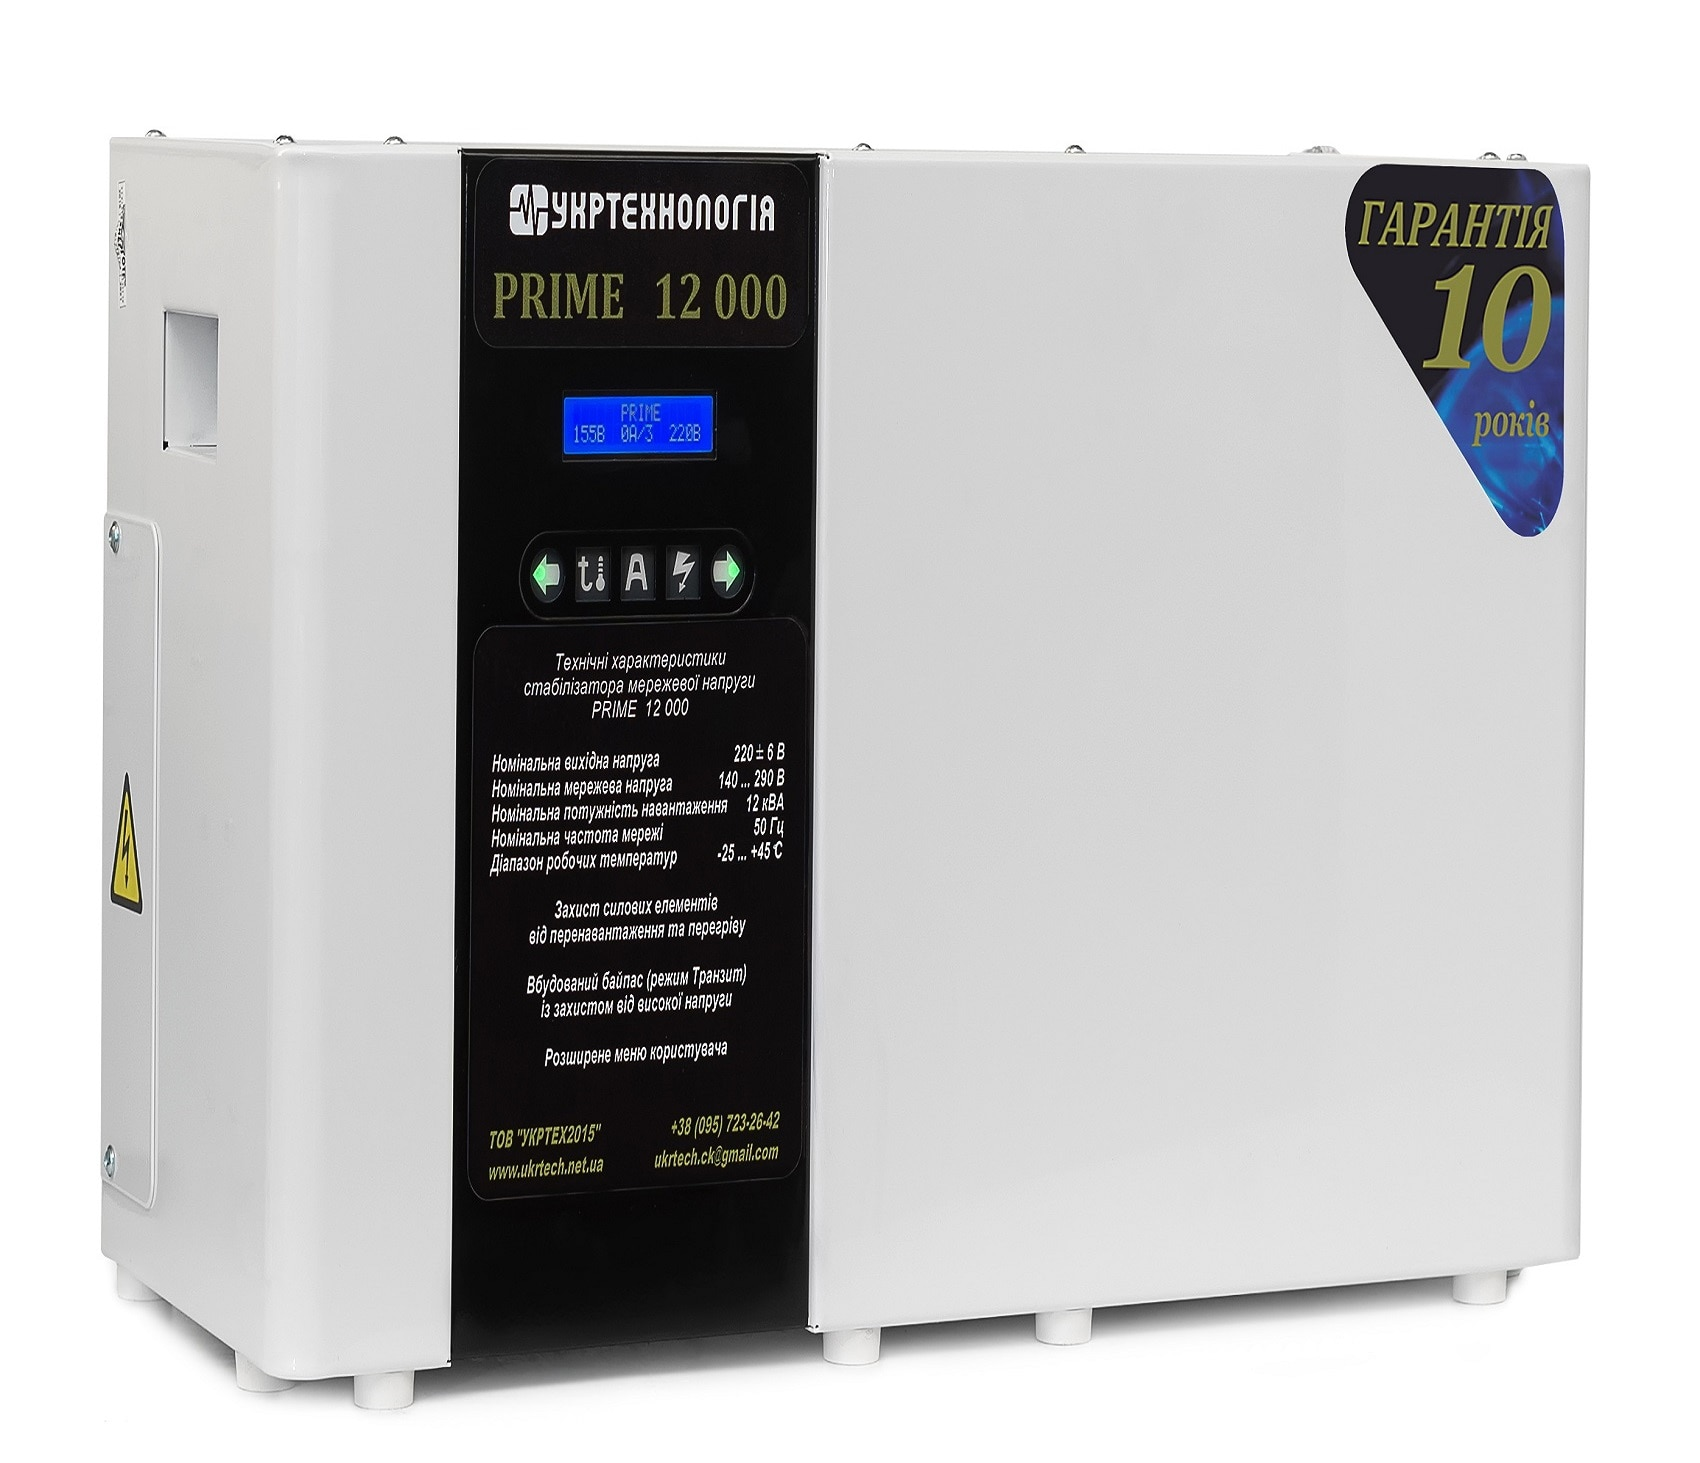 Стабилизаторы напряжения - Стабилизатор напряжения 12 кВт РRIME 000001456 - Фото 4